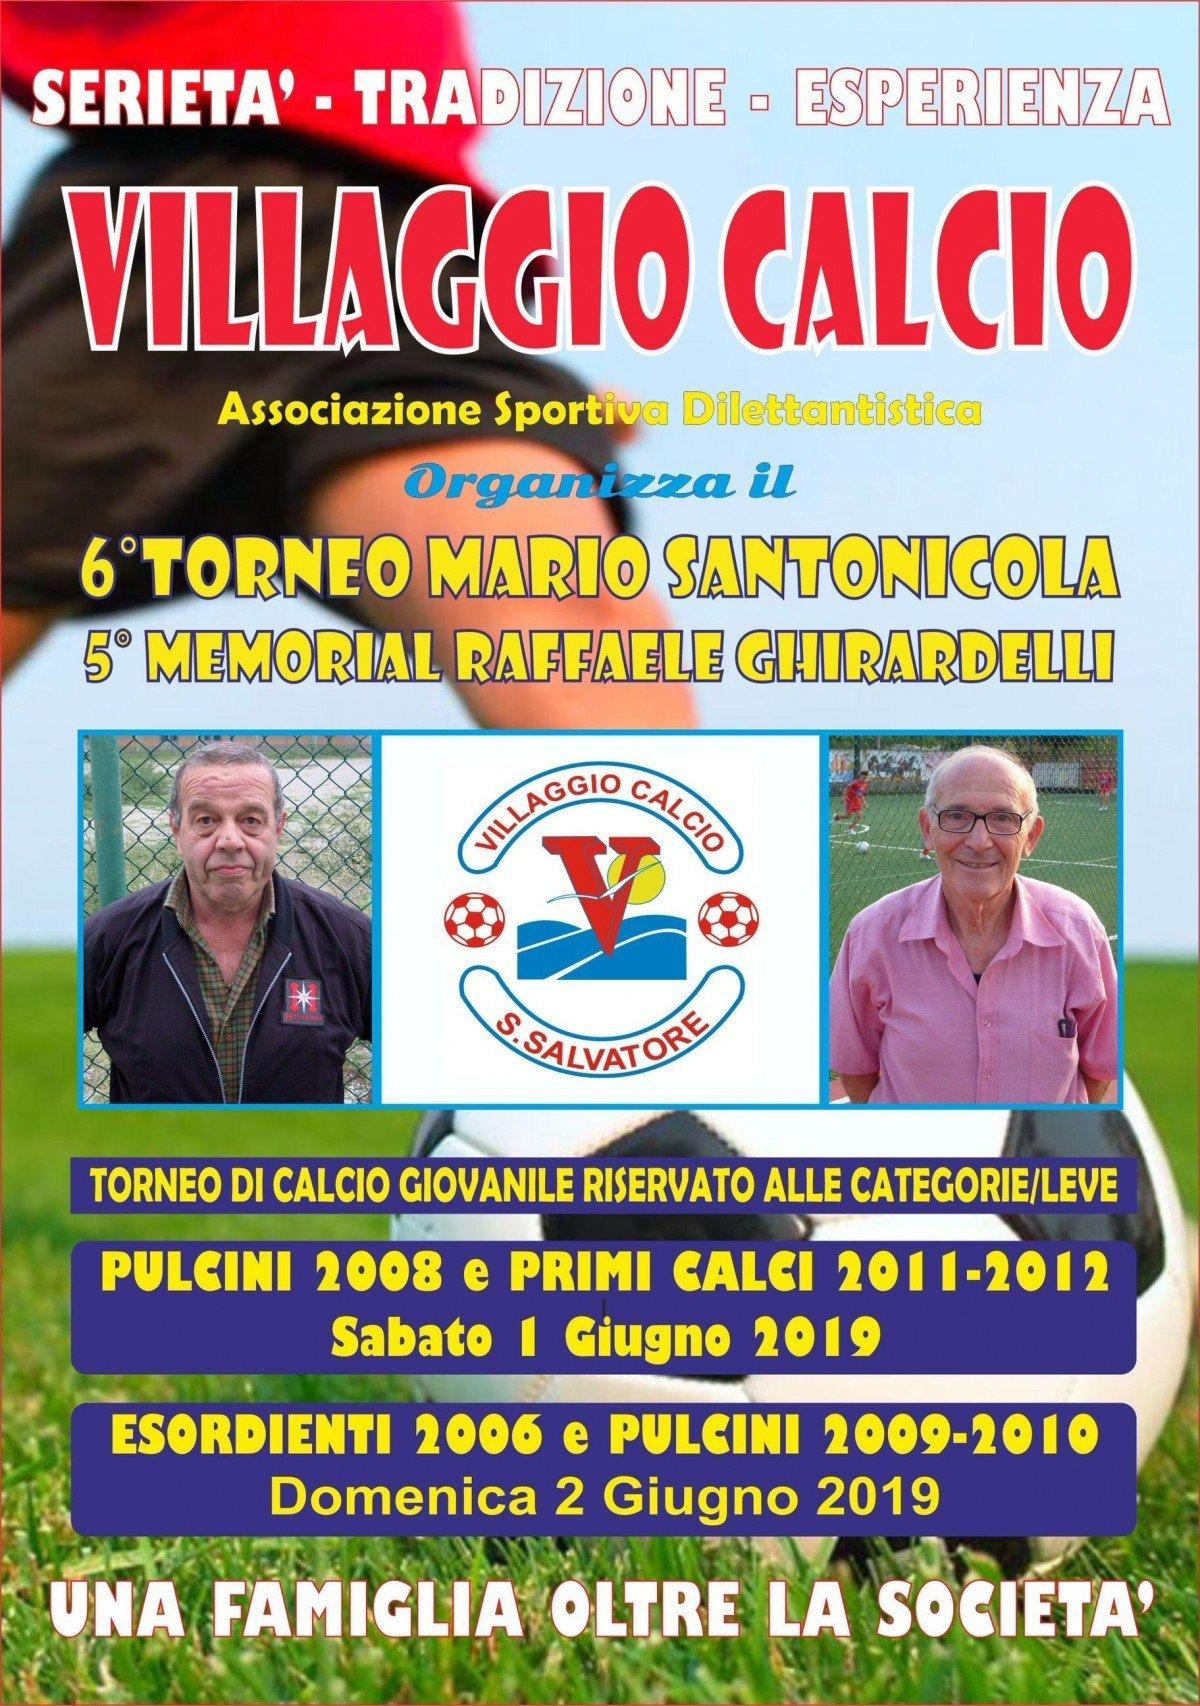 Villaggio Calcio 6° Torneo Mario Santonicola - 5° Memorial Raffaele Ghirardelli locandina